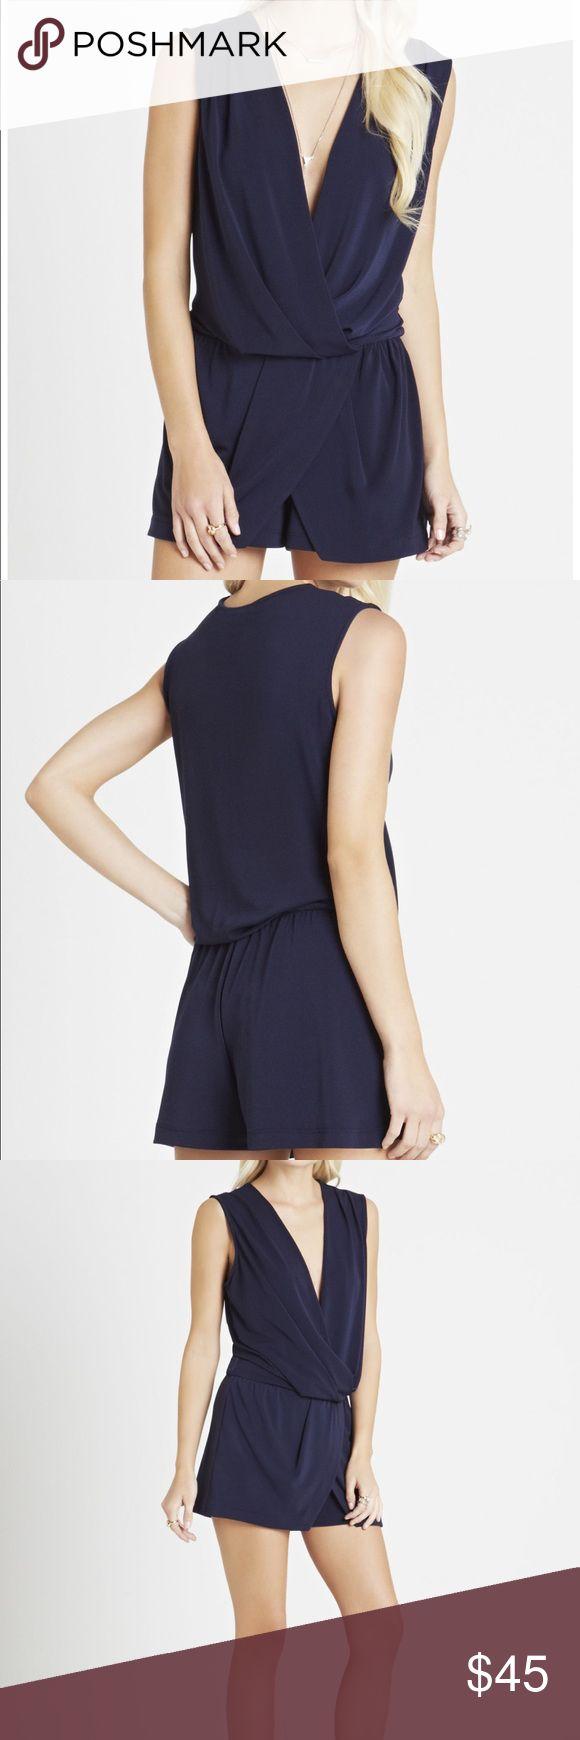 "NWT BCBGENERATION V Neck Skort Romper XS V-neckline. Sleeveless. Skort bottom. Shirred waistline. Faux wrap silhouette. Short-length inseam, 3"". Self: Polyester, Spandex crepe. Machine Wash. Imported. BCBGeneration Shorts Skorts"